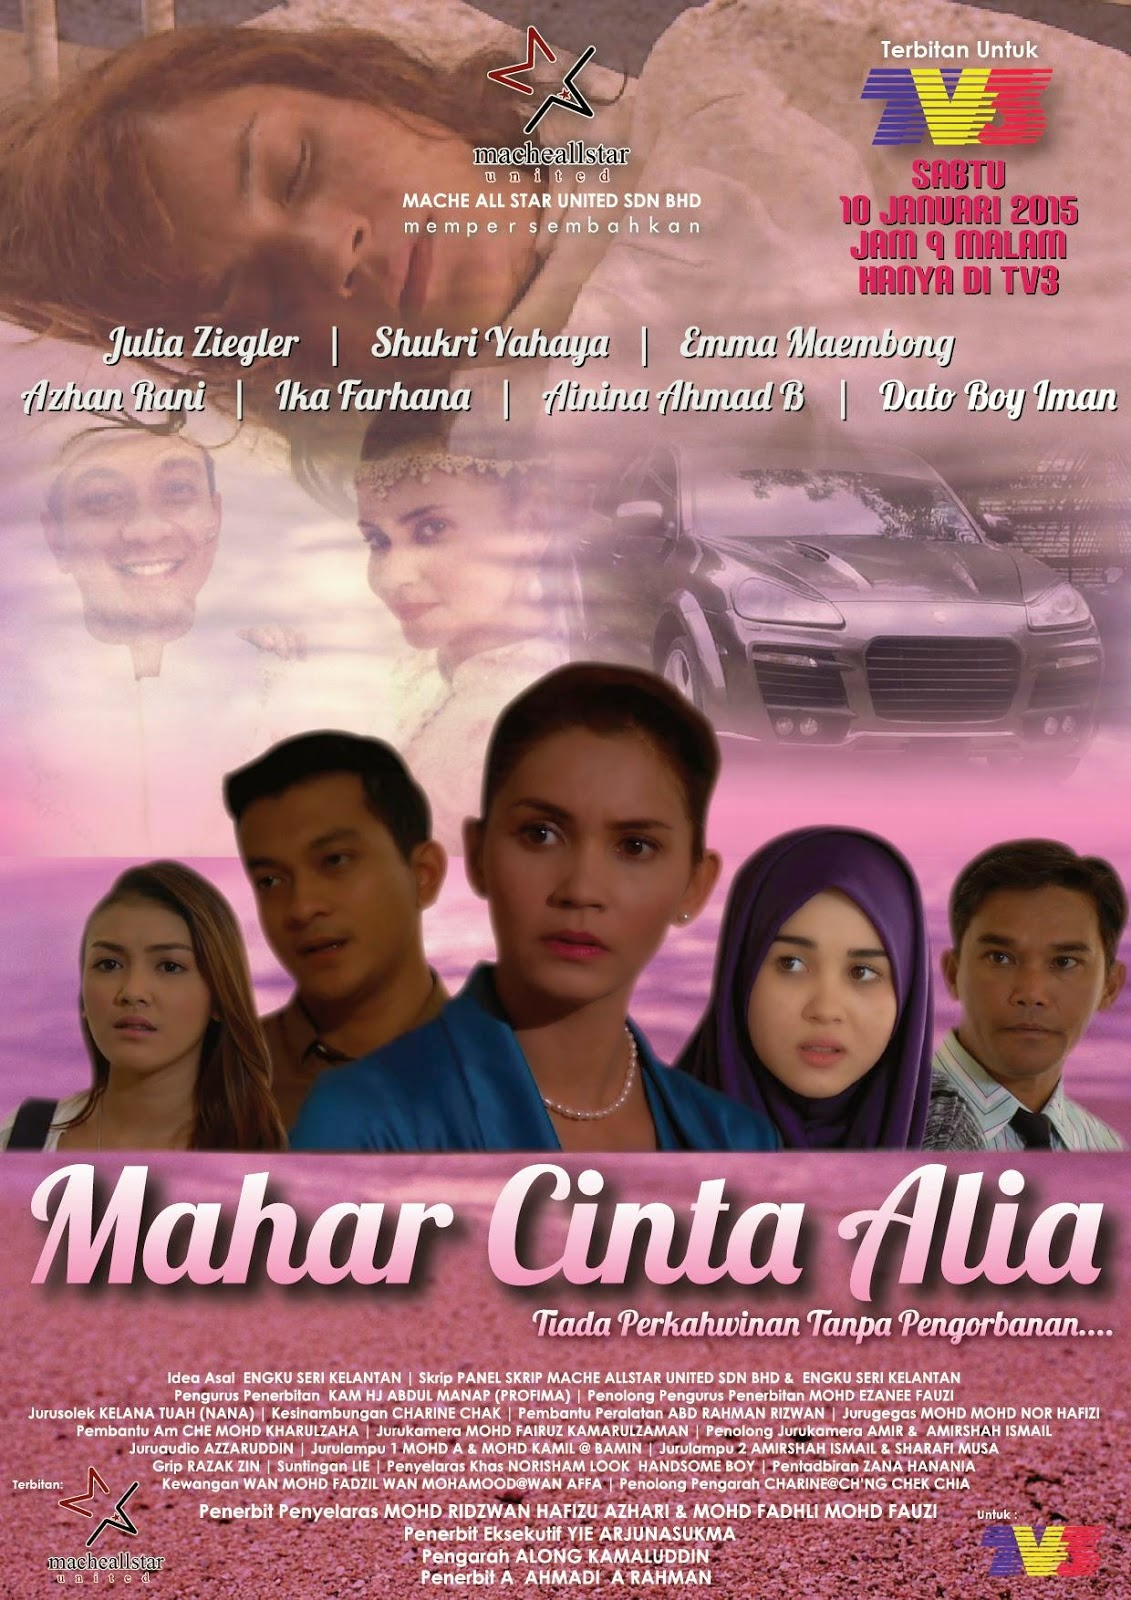 Mahar Cinta Alia [2015]Cerekarama